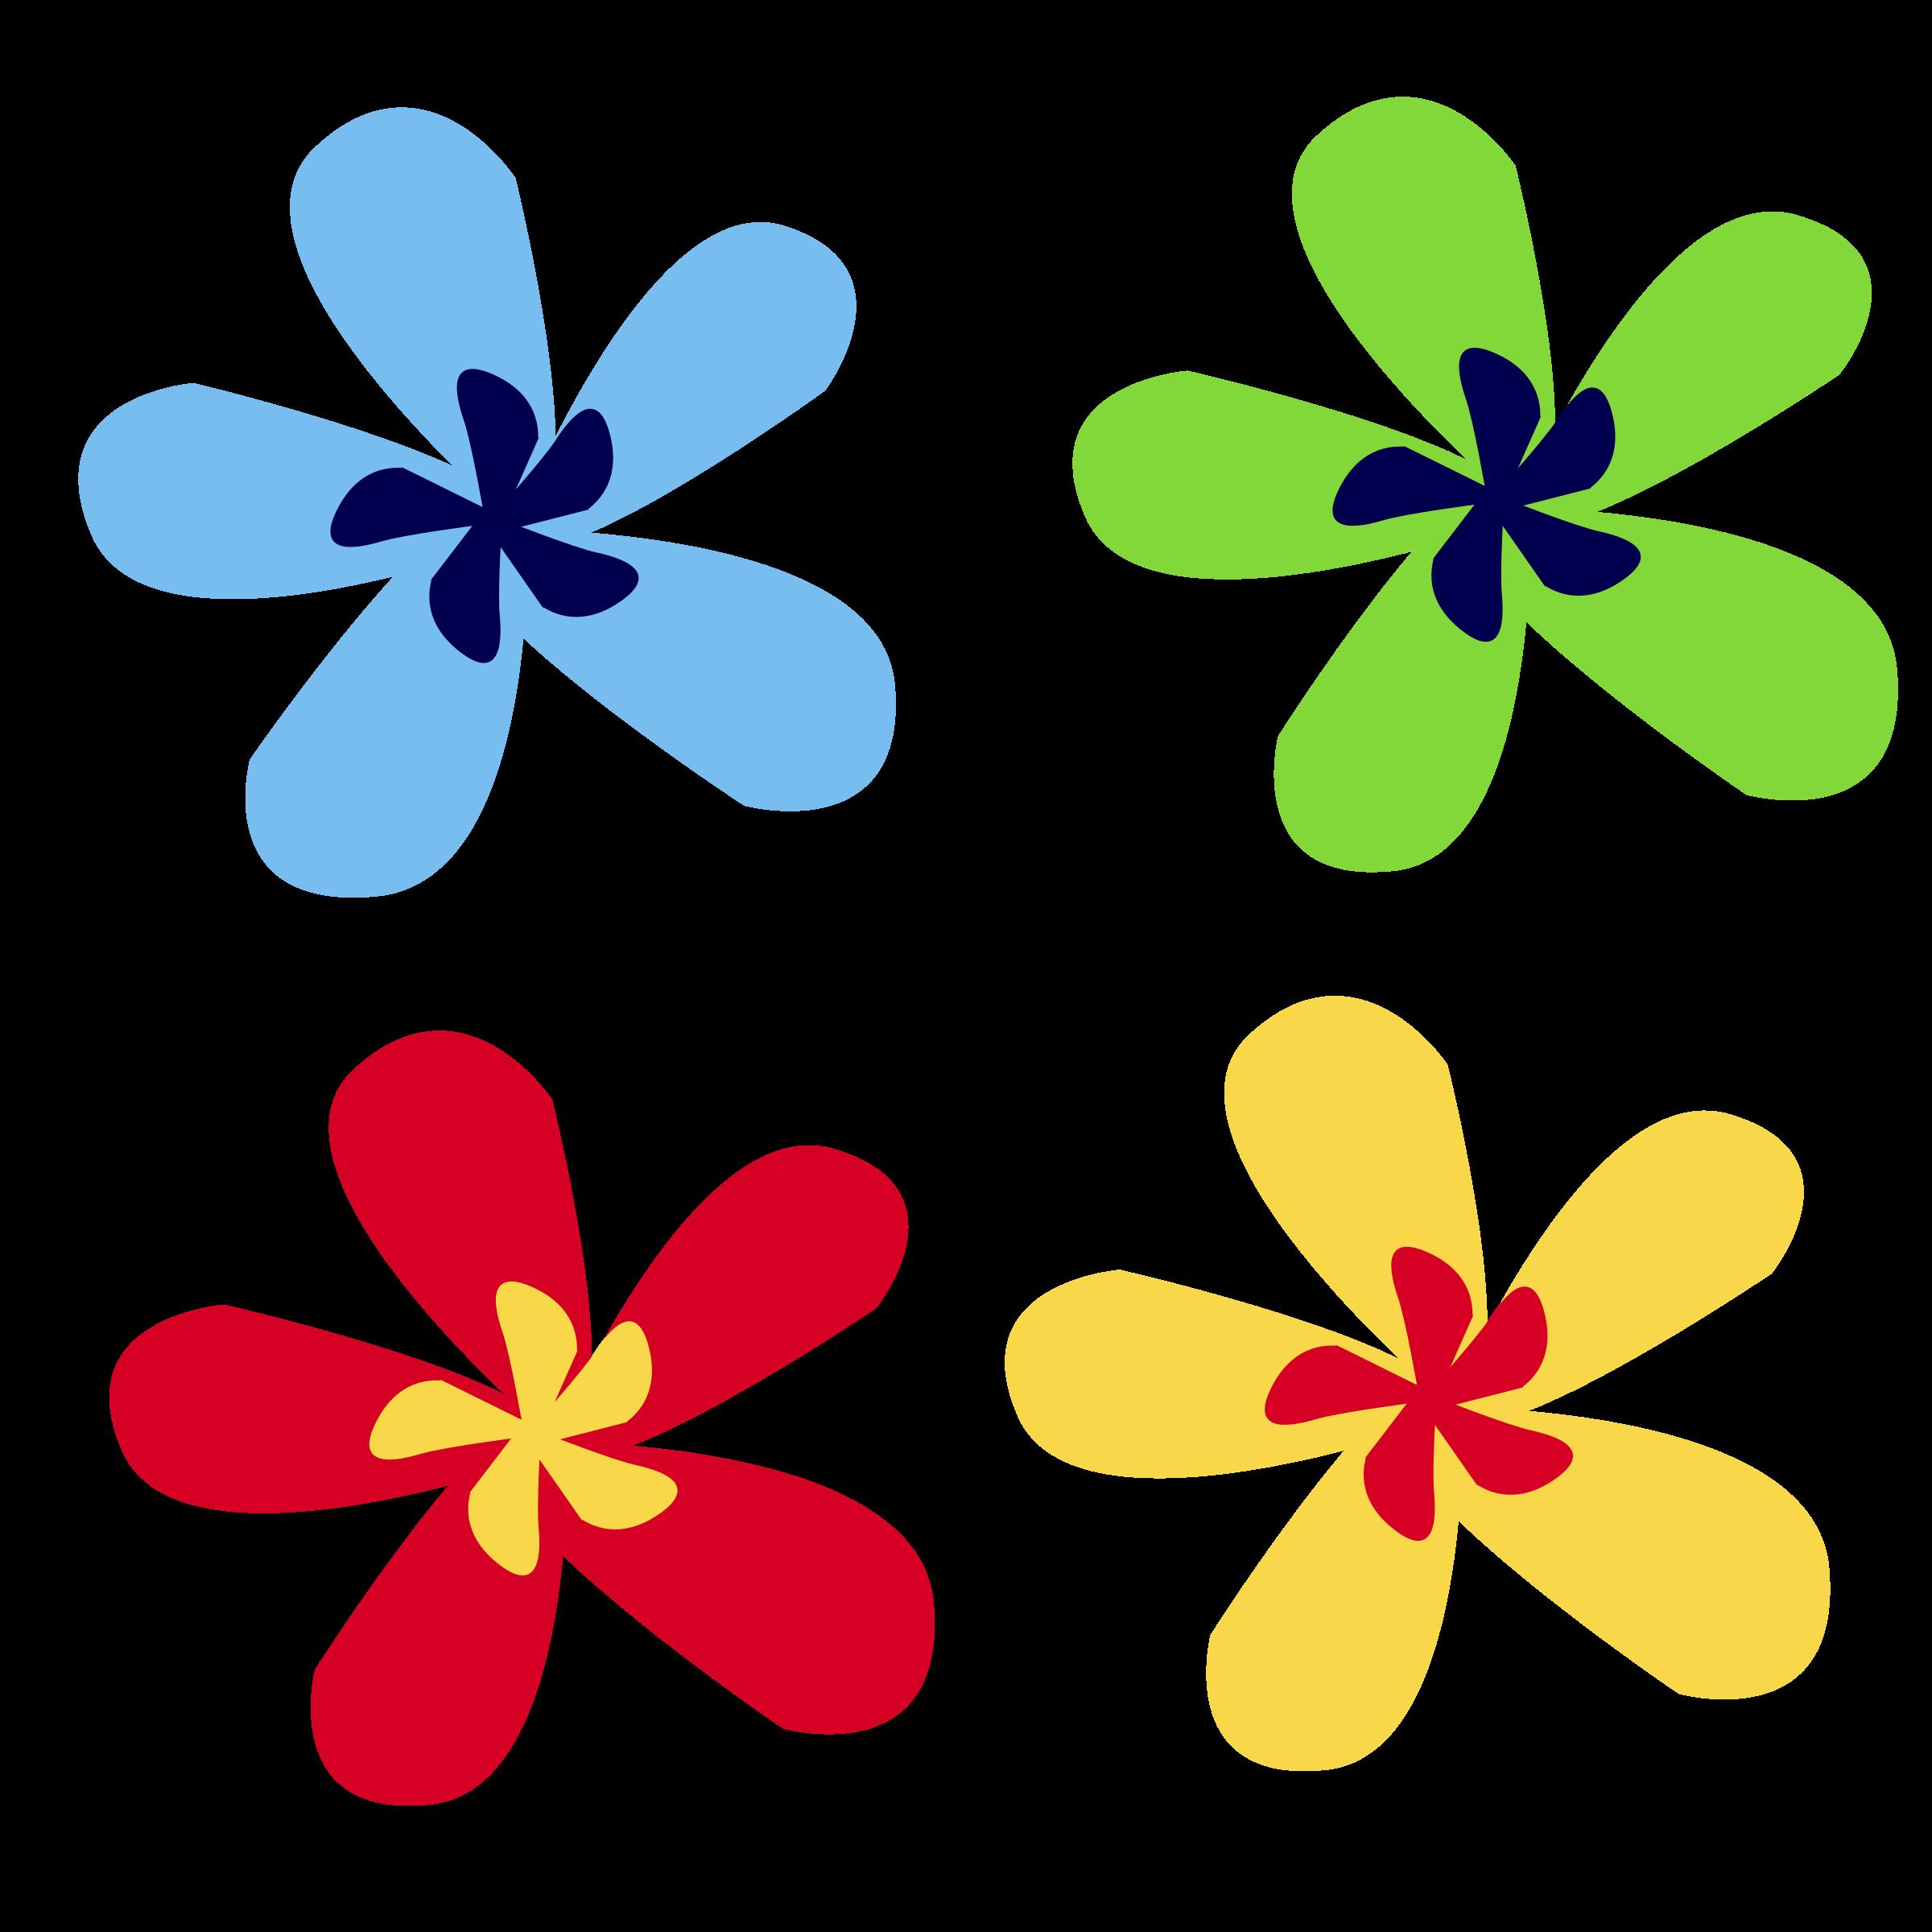 Designs Clipart Flowers.